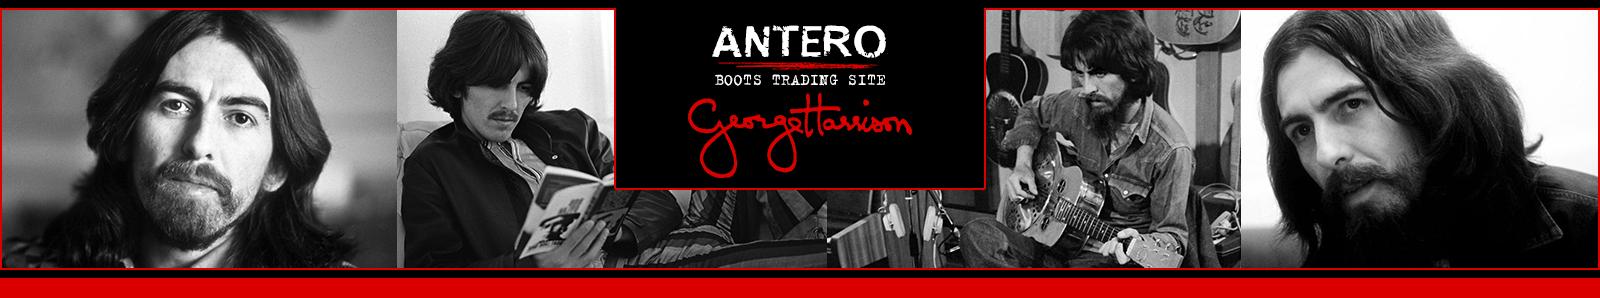 Antero Boots Trading Site